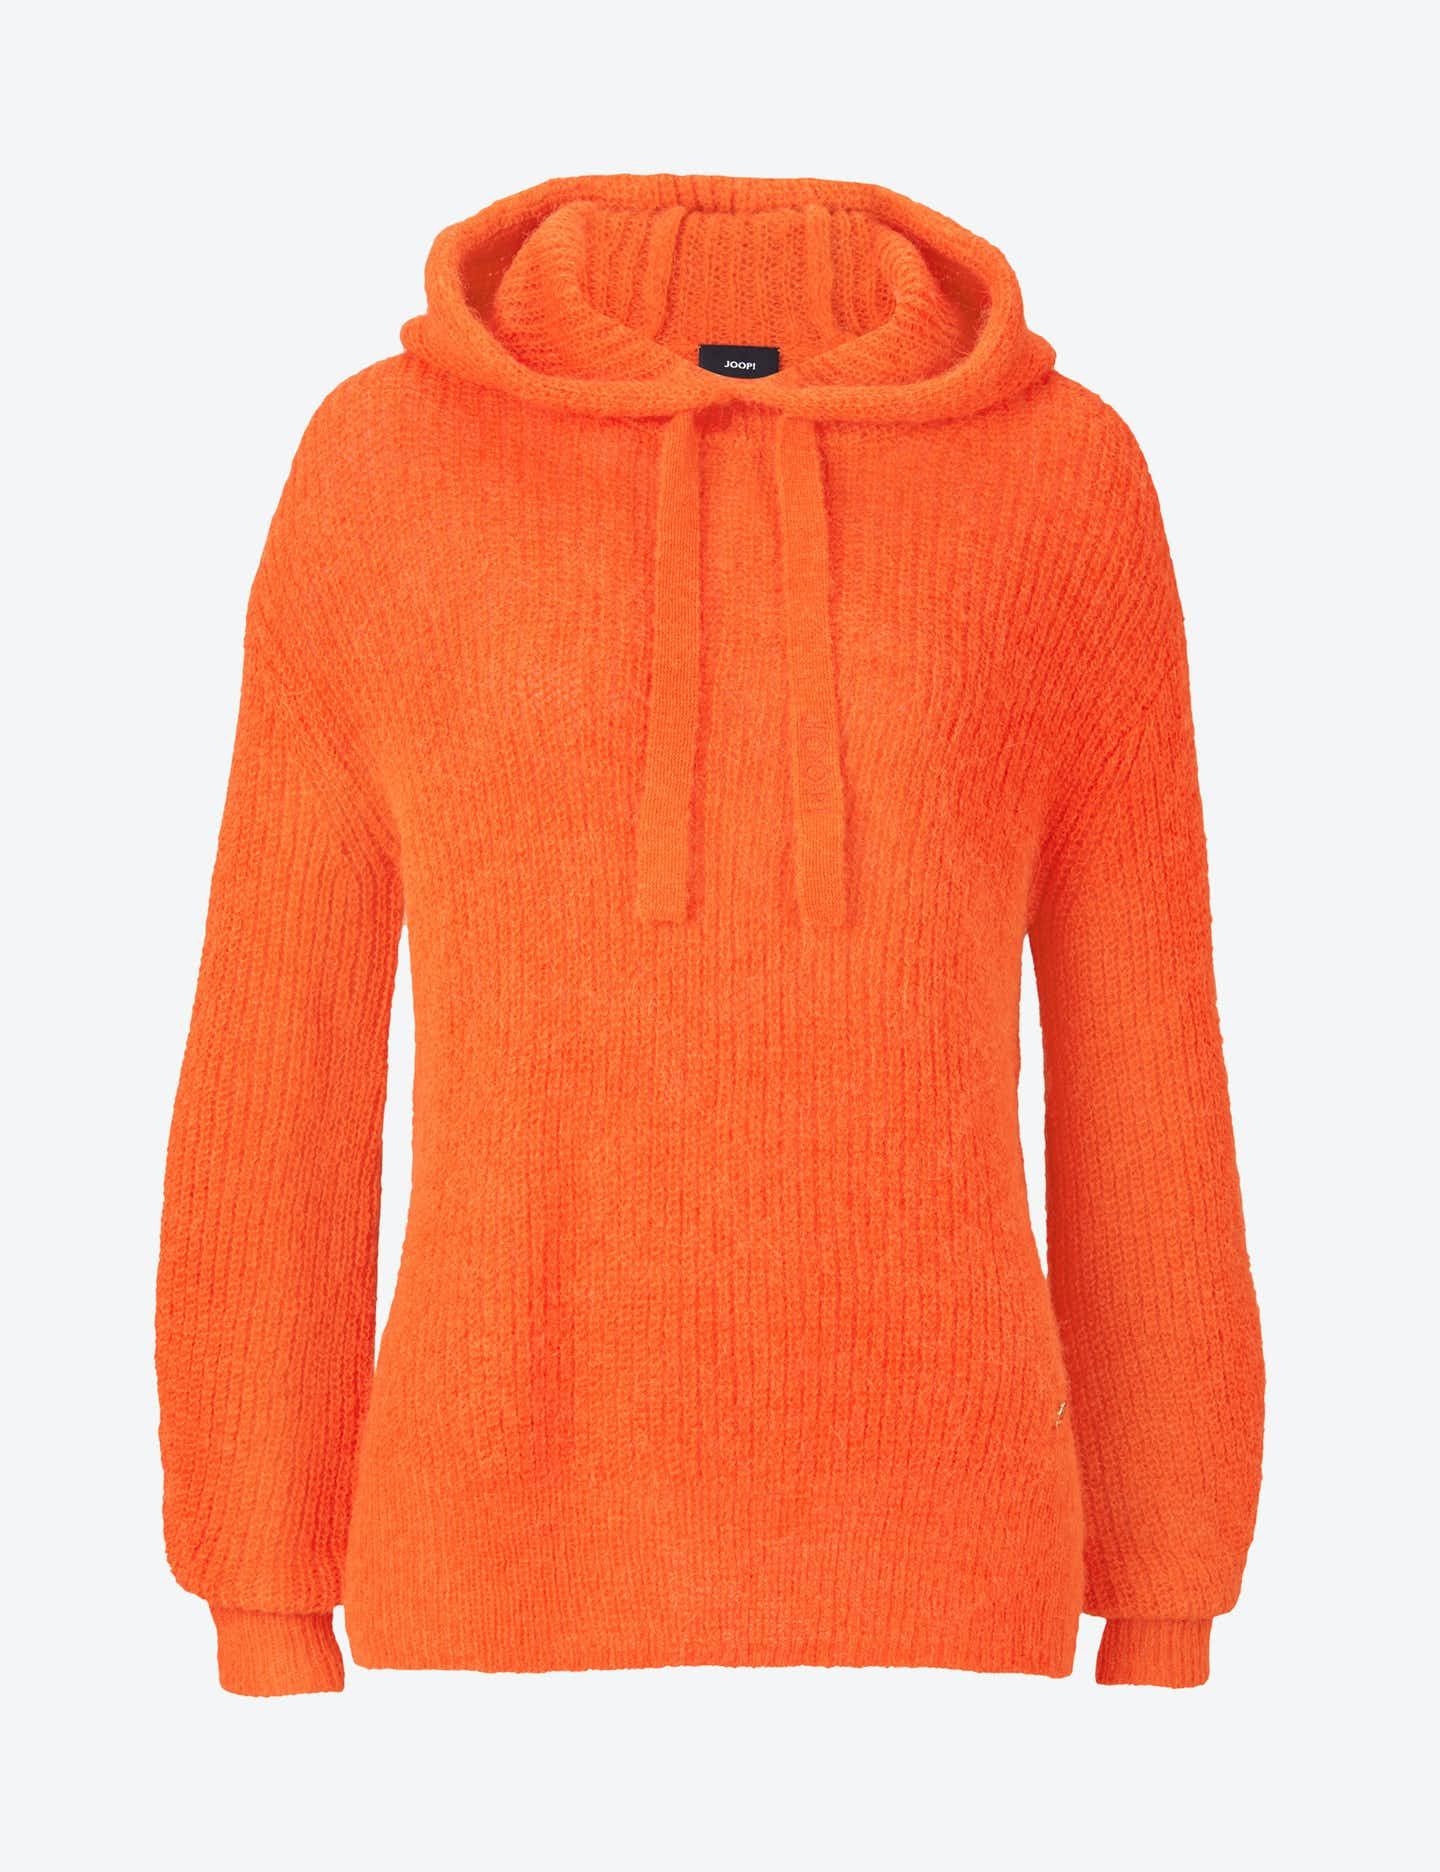 Sweater Keral in Orange